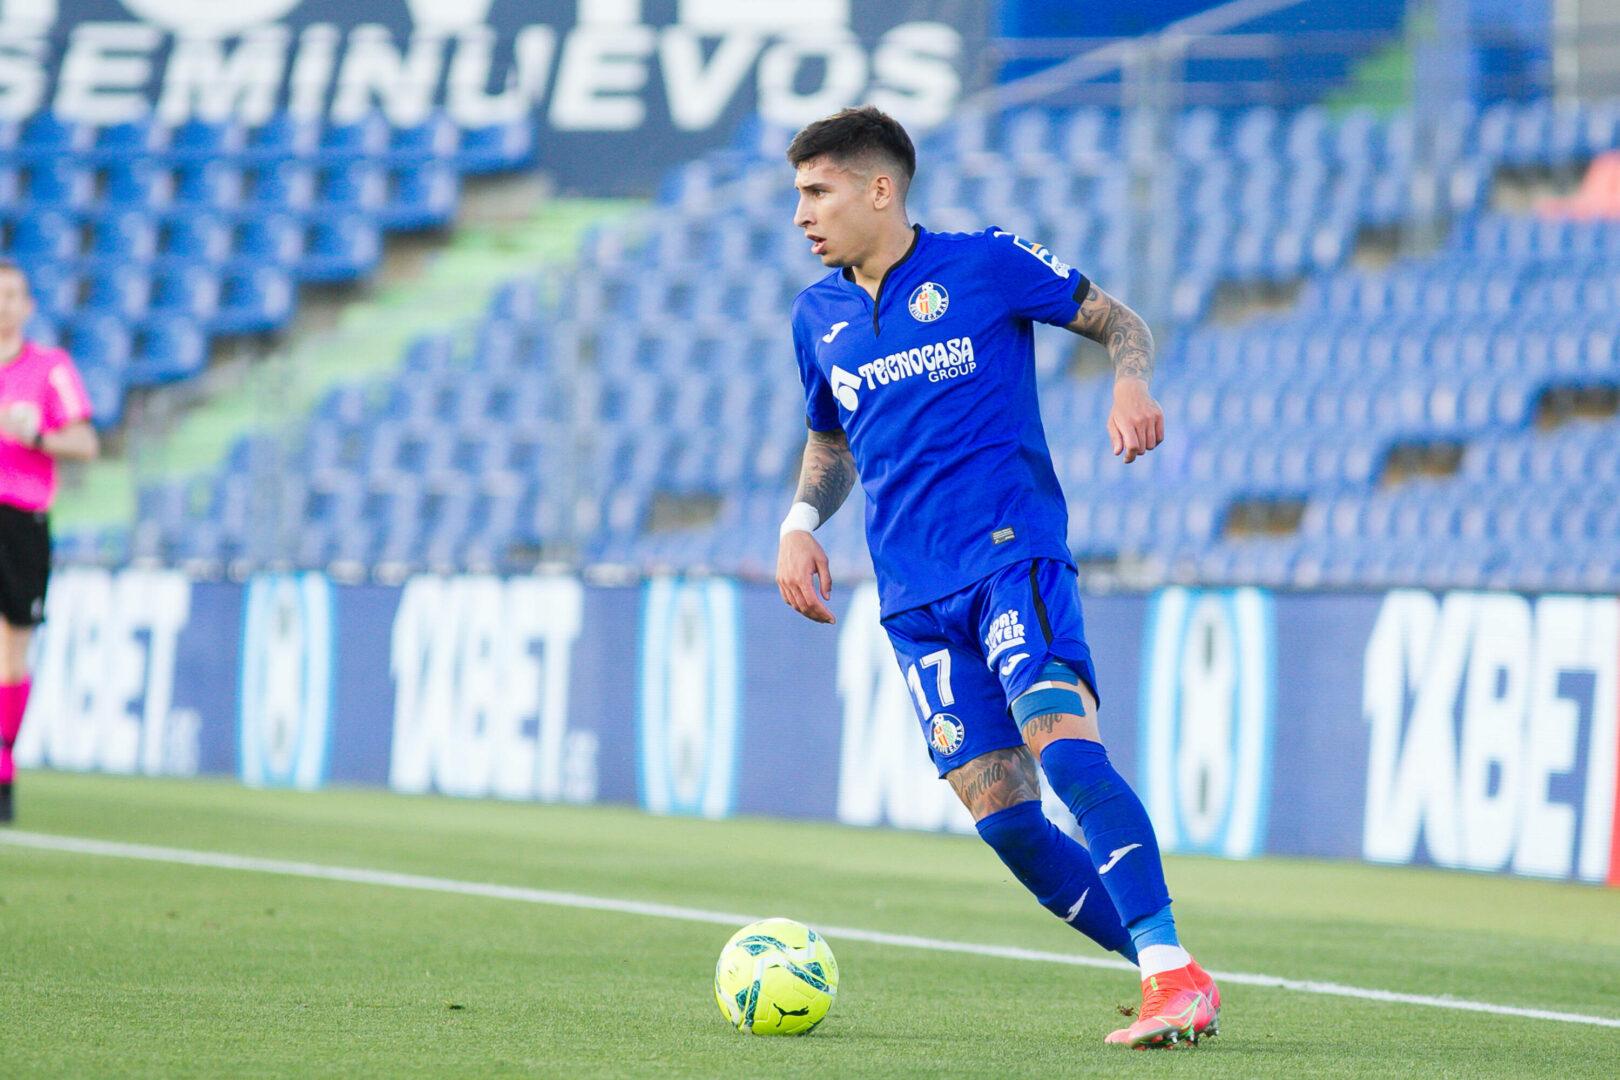 SSC Neapel: Interesse an Mathias Olivera vom FC Getafe